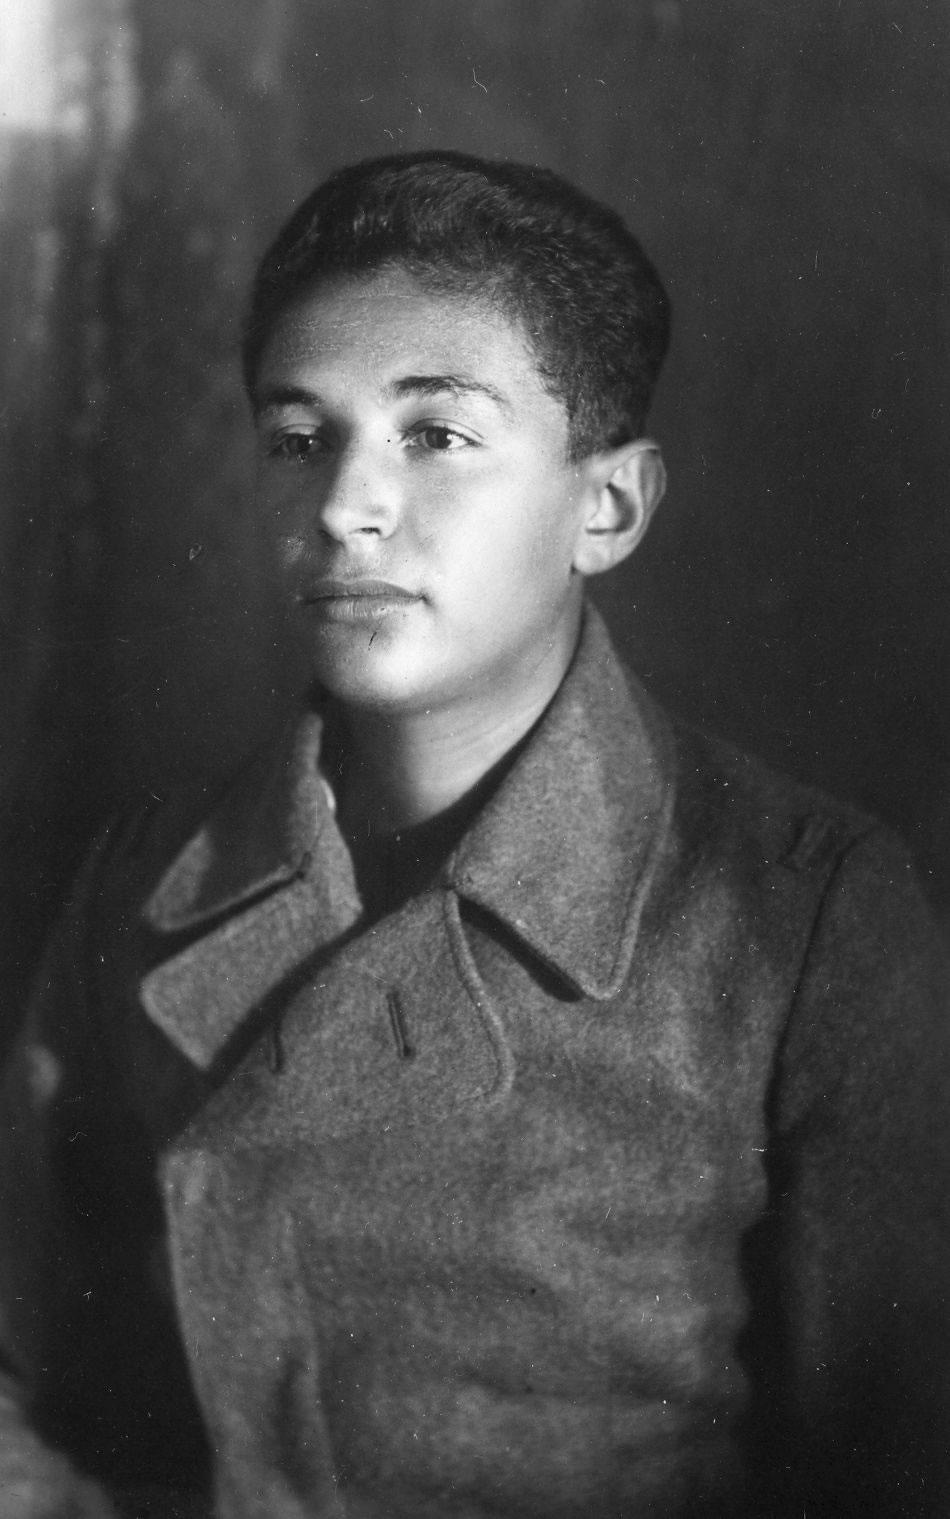 rabai_imre_a_lager_utan_munchenben_nemet_katonai_ruhaban_1946_augusztus.jpg